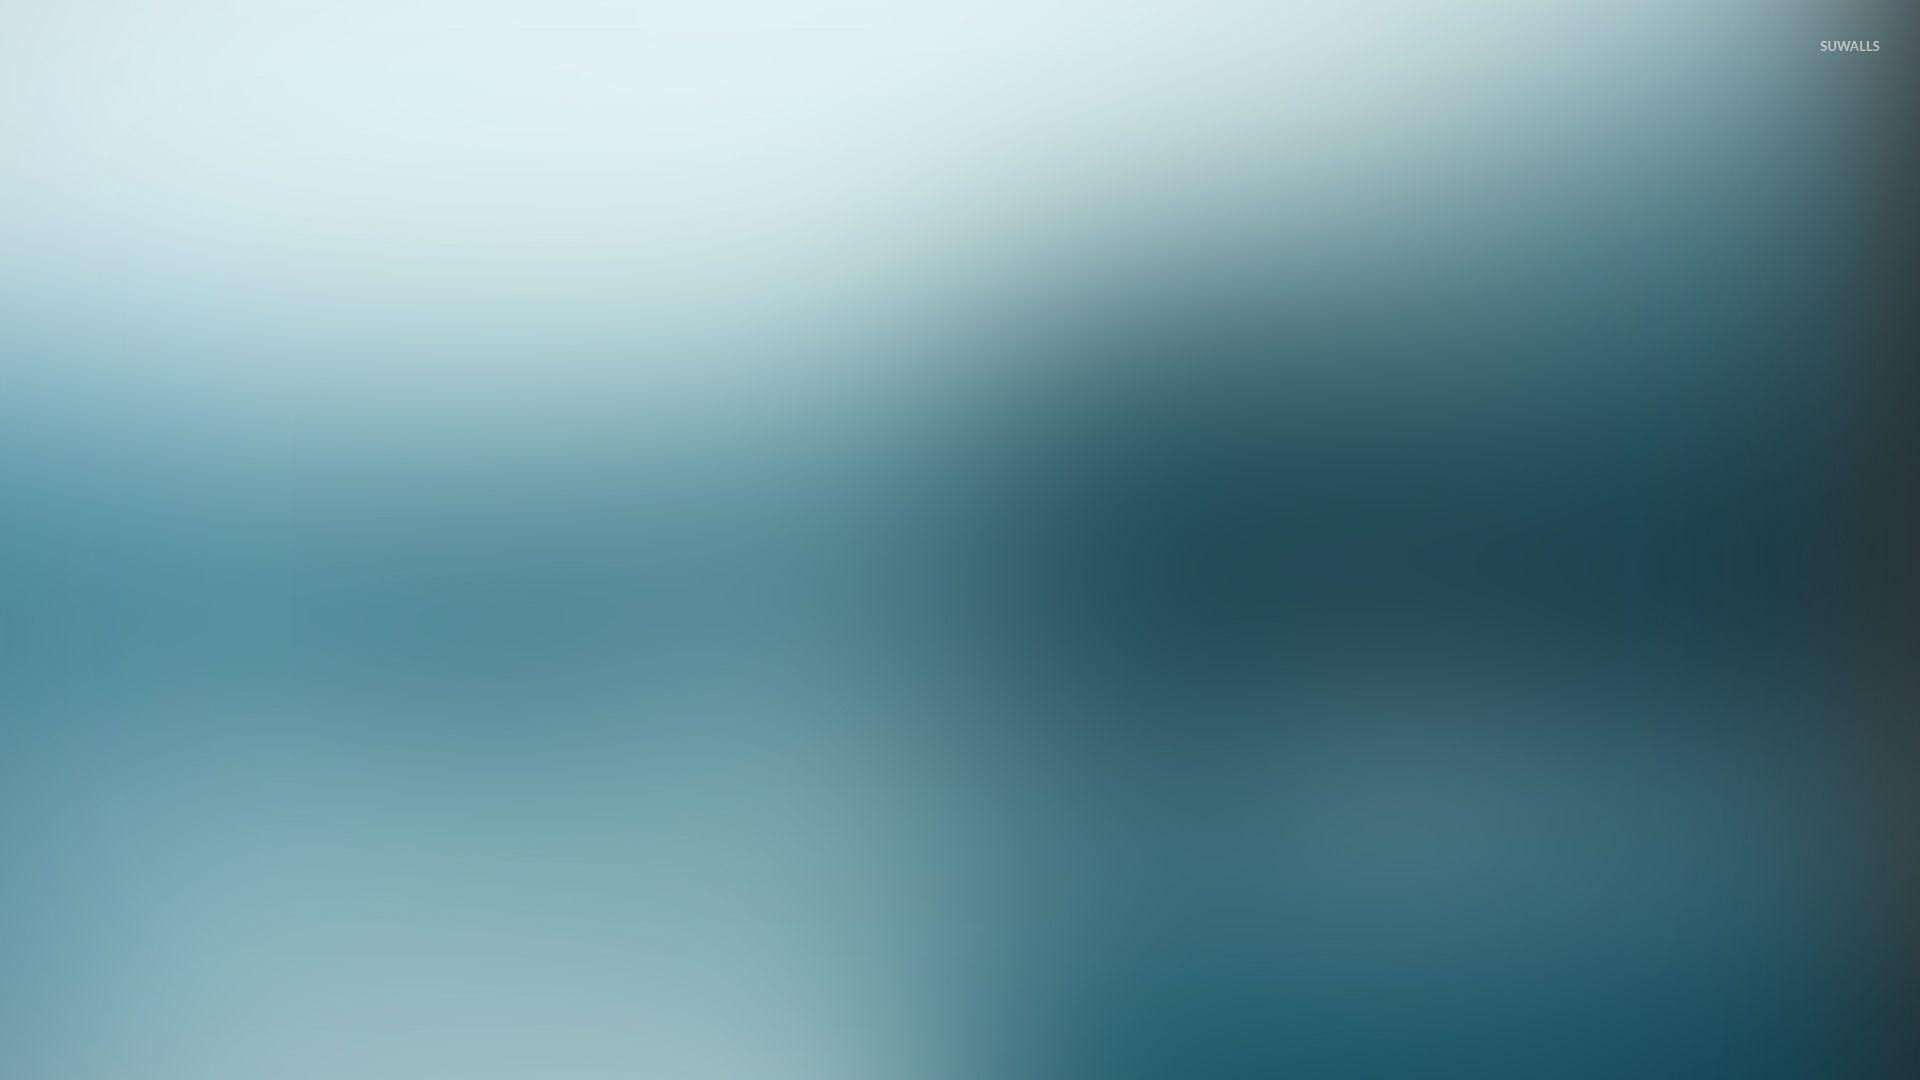 blue blur 2 wallpaper - photo #9